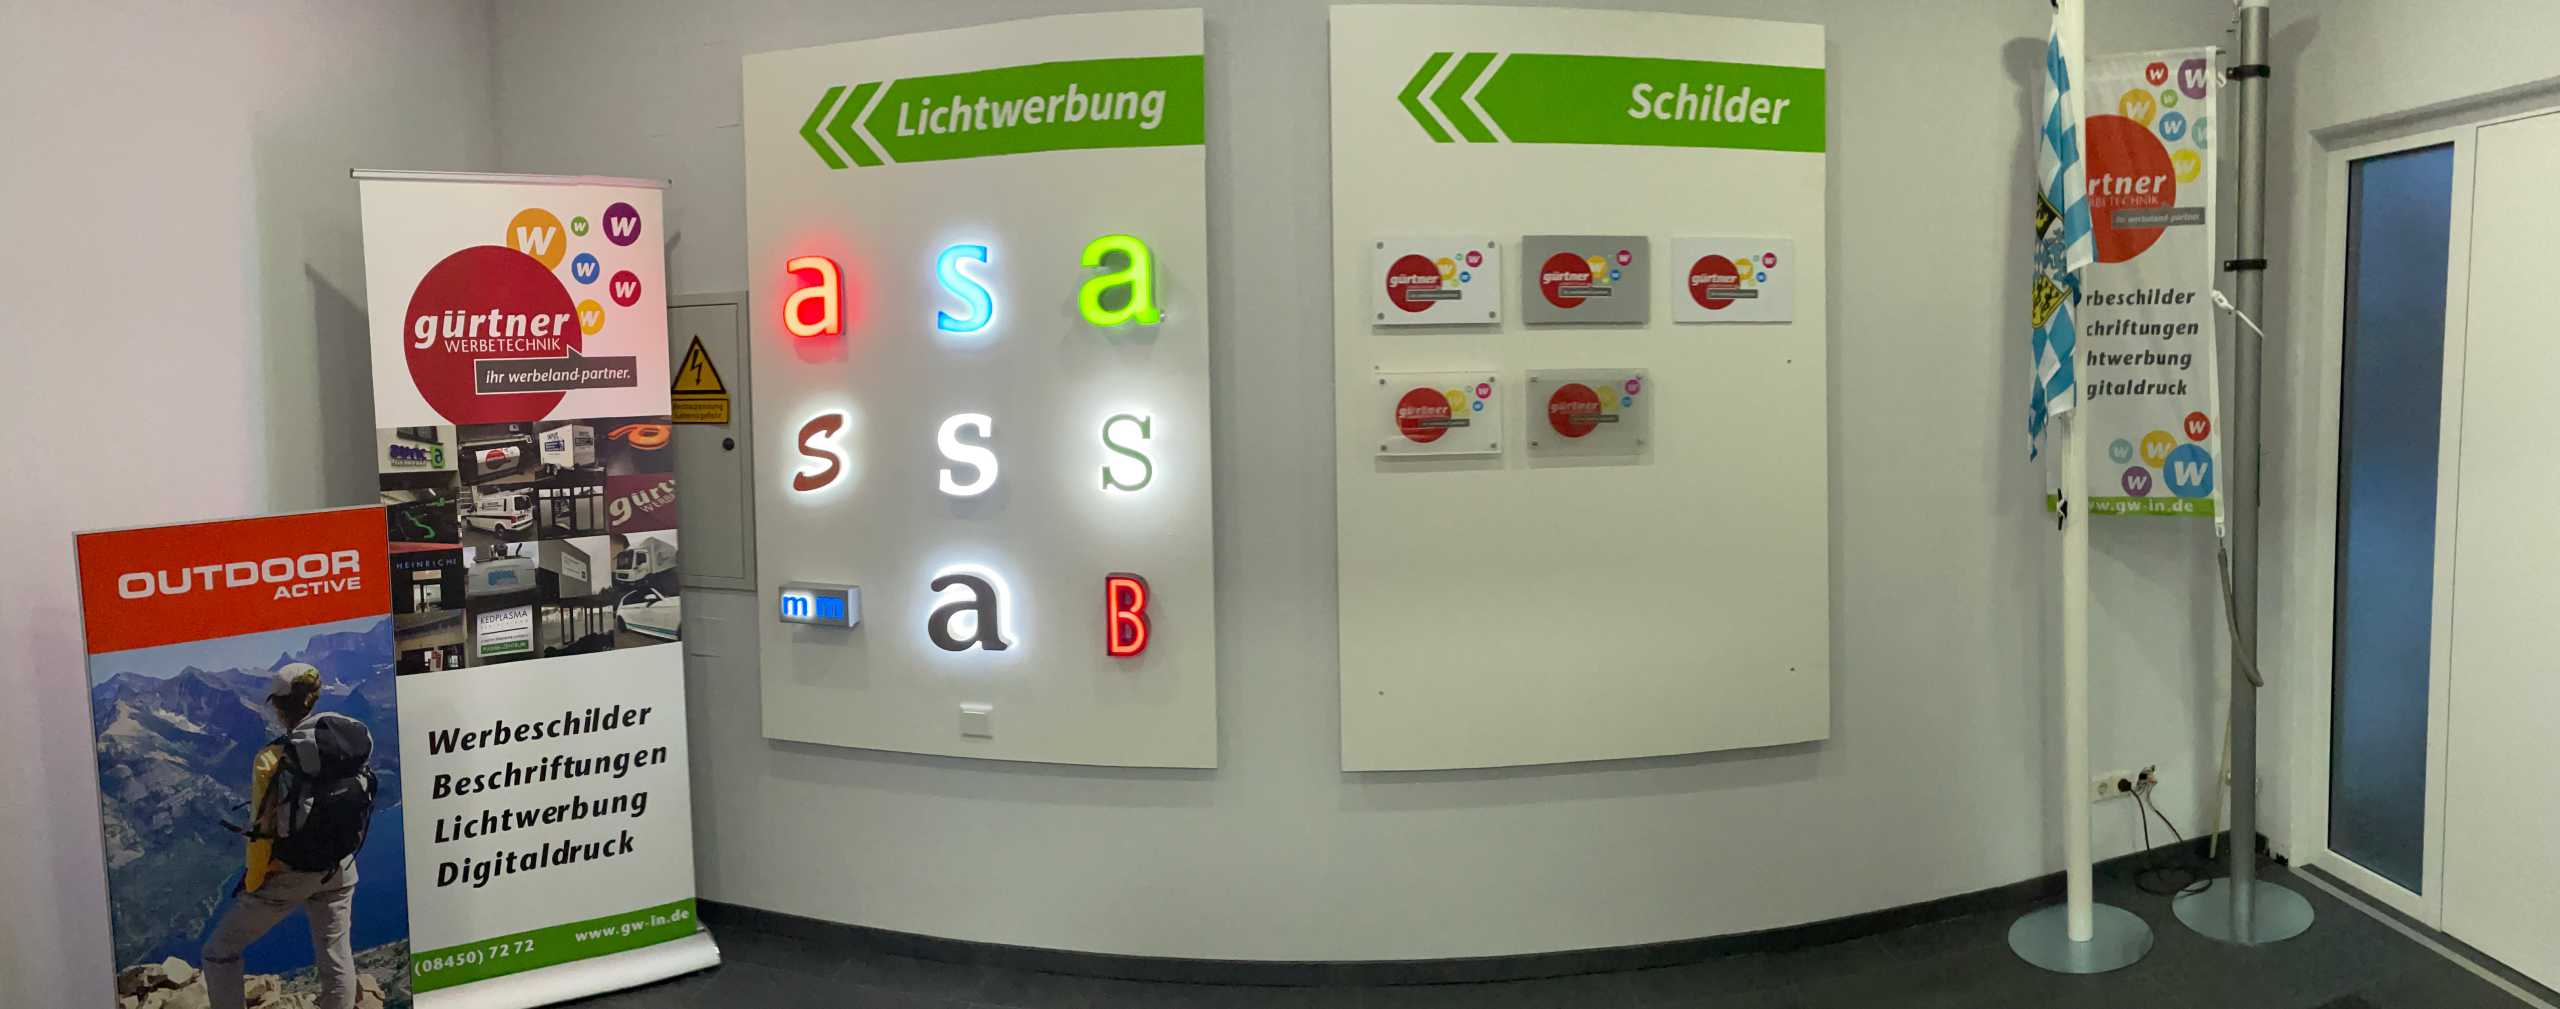 Gürtner Werbetechnik Ingolstadt